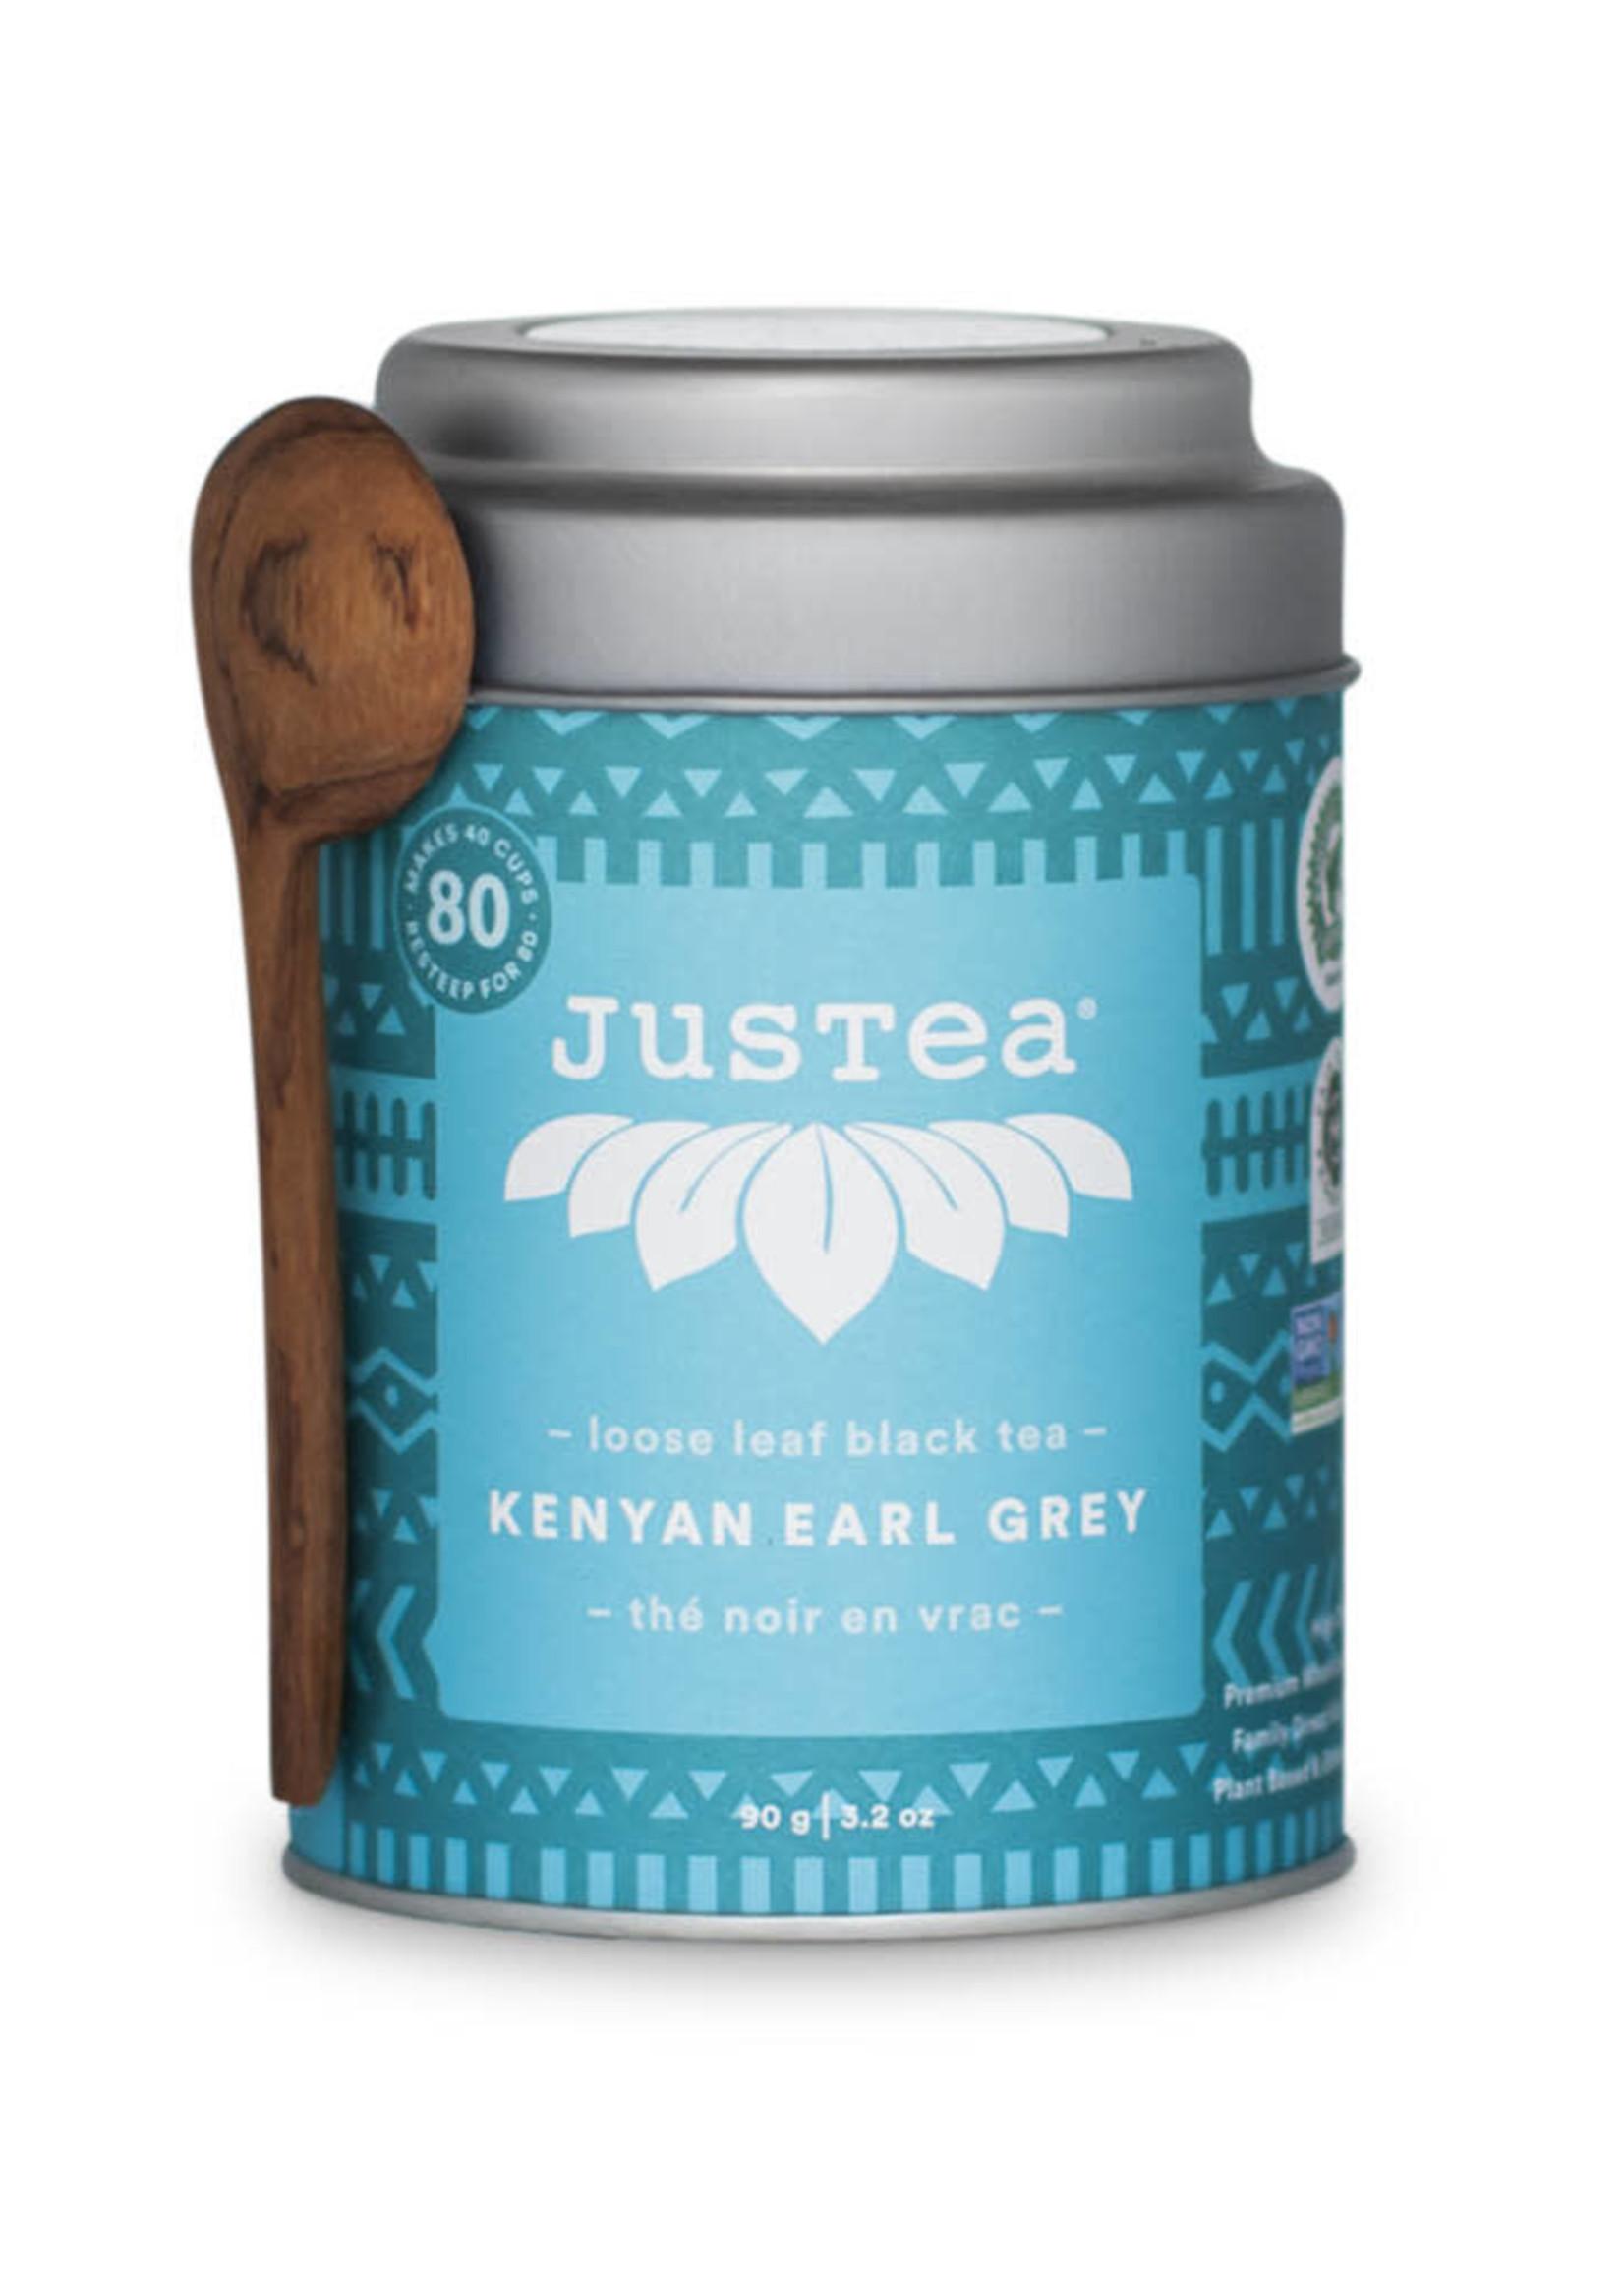 Justea Justea - Kenyan Earl Grey